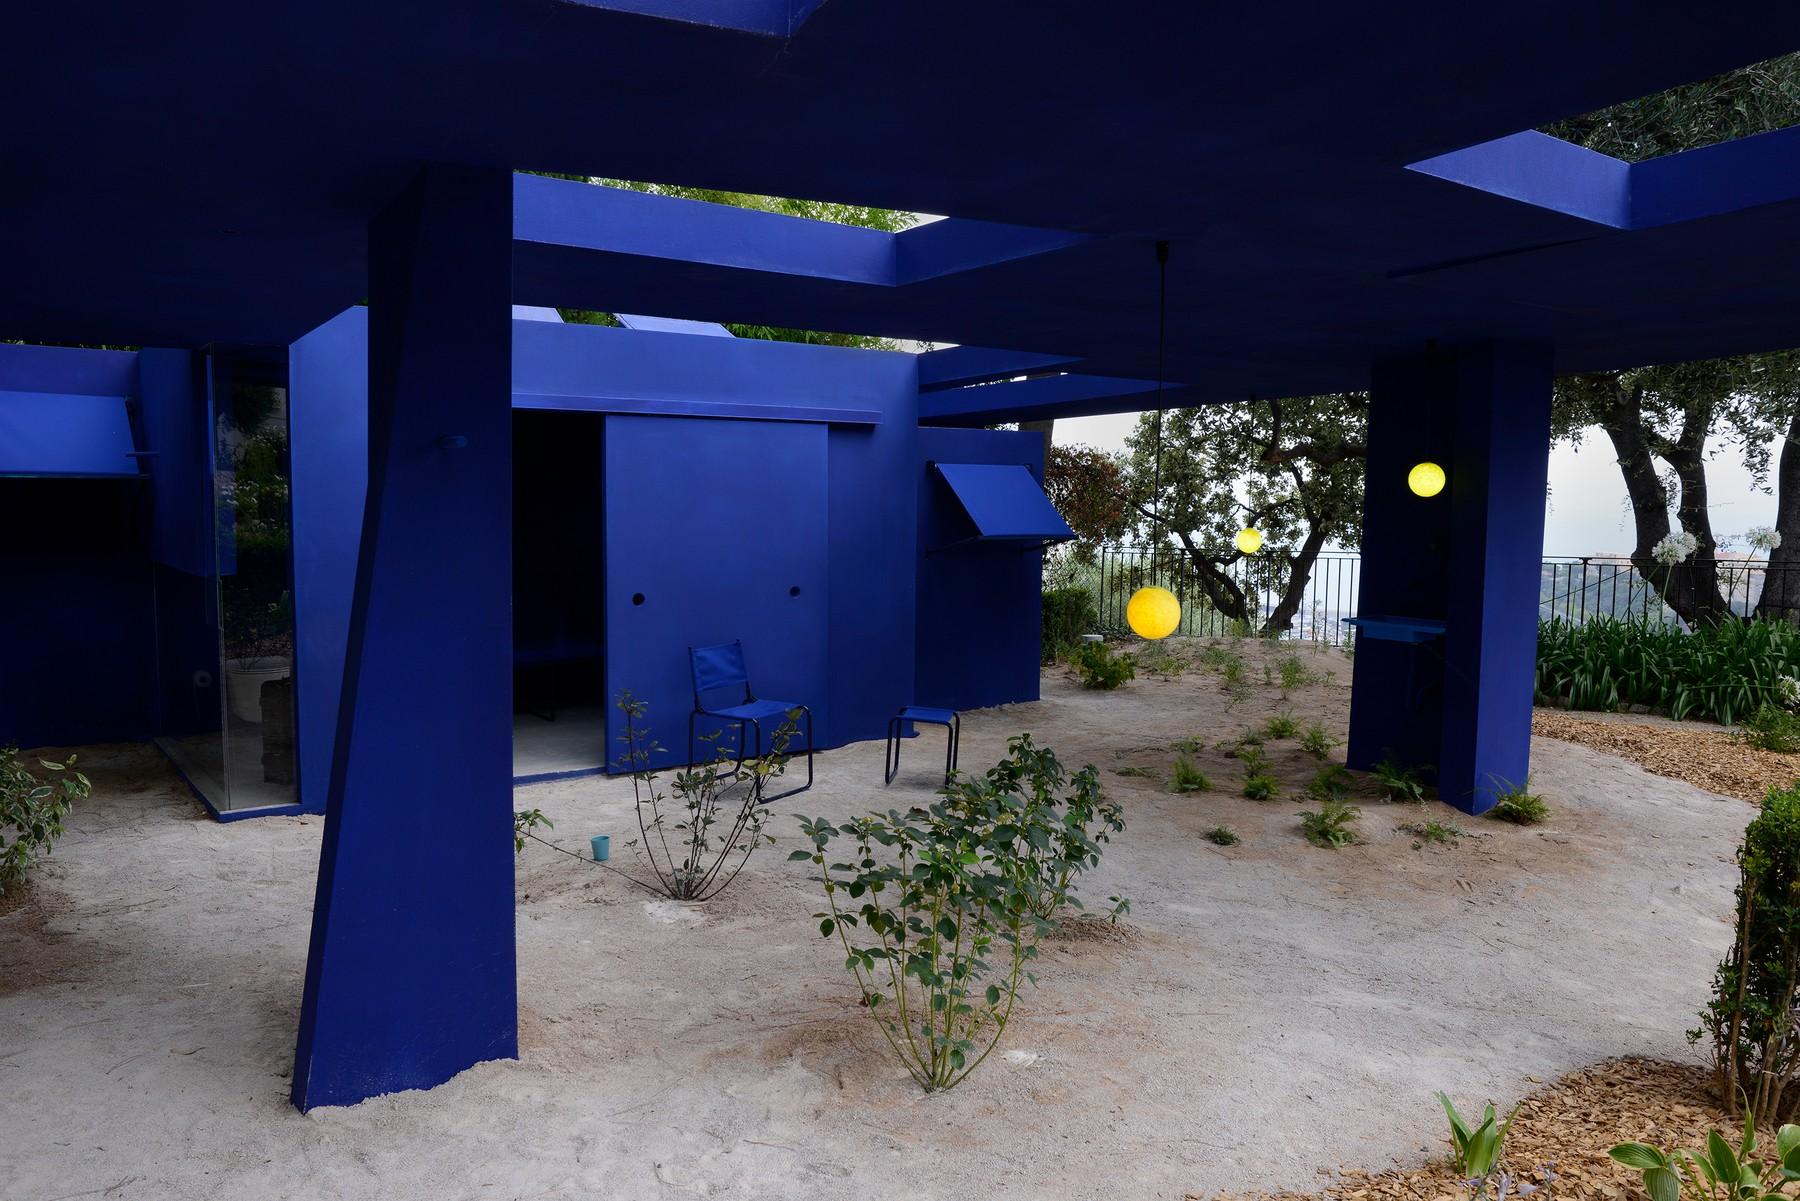 jean-pascal-flavien-folding-house_10.jpg